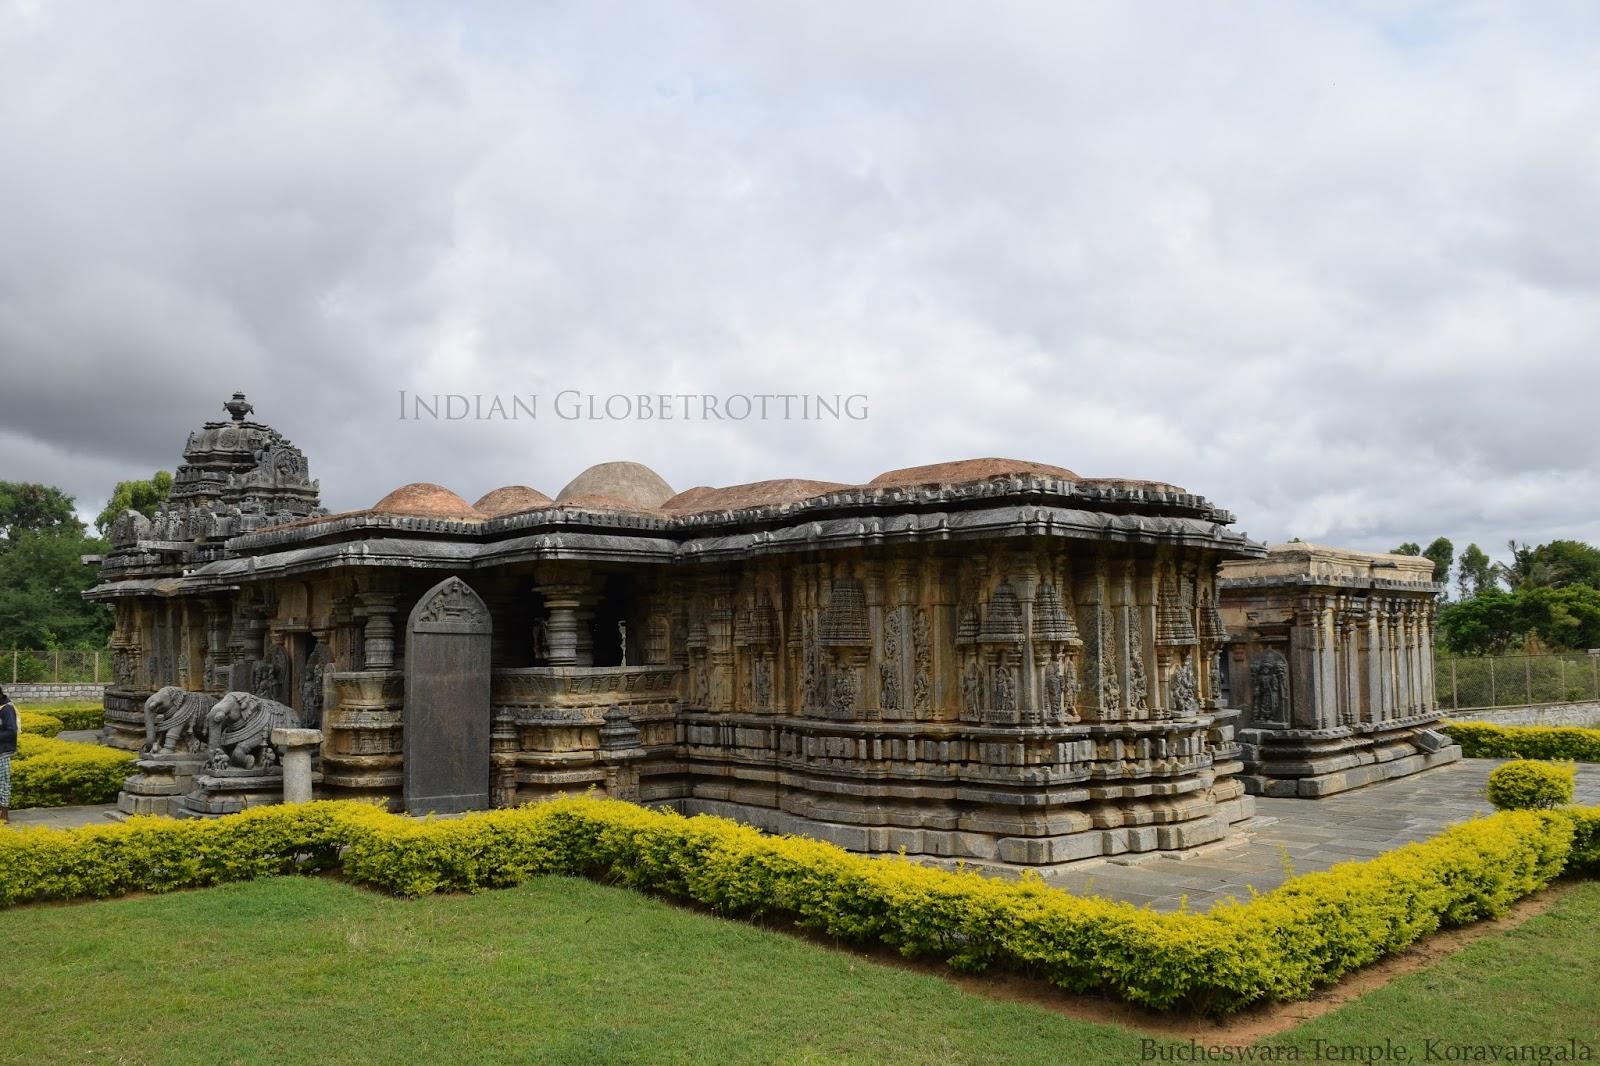 Bucheswara temple in koravangala in karnataka constructed by the hoysala dynasty